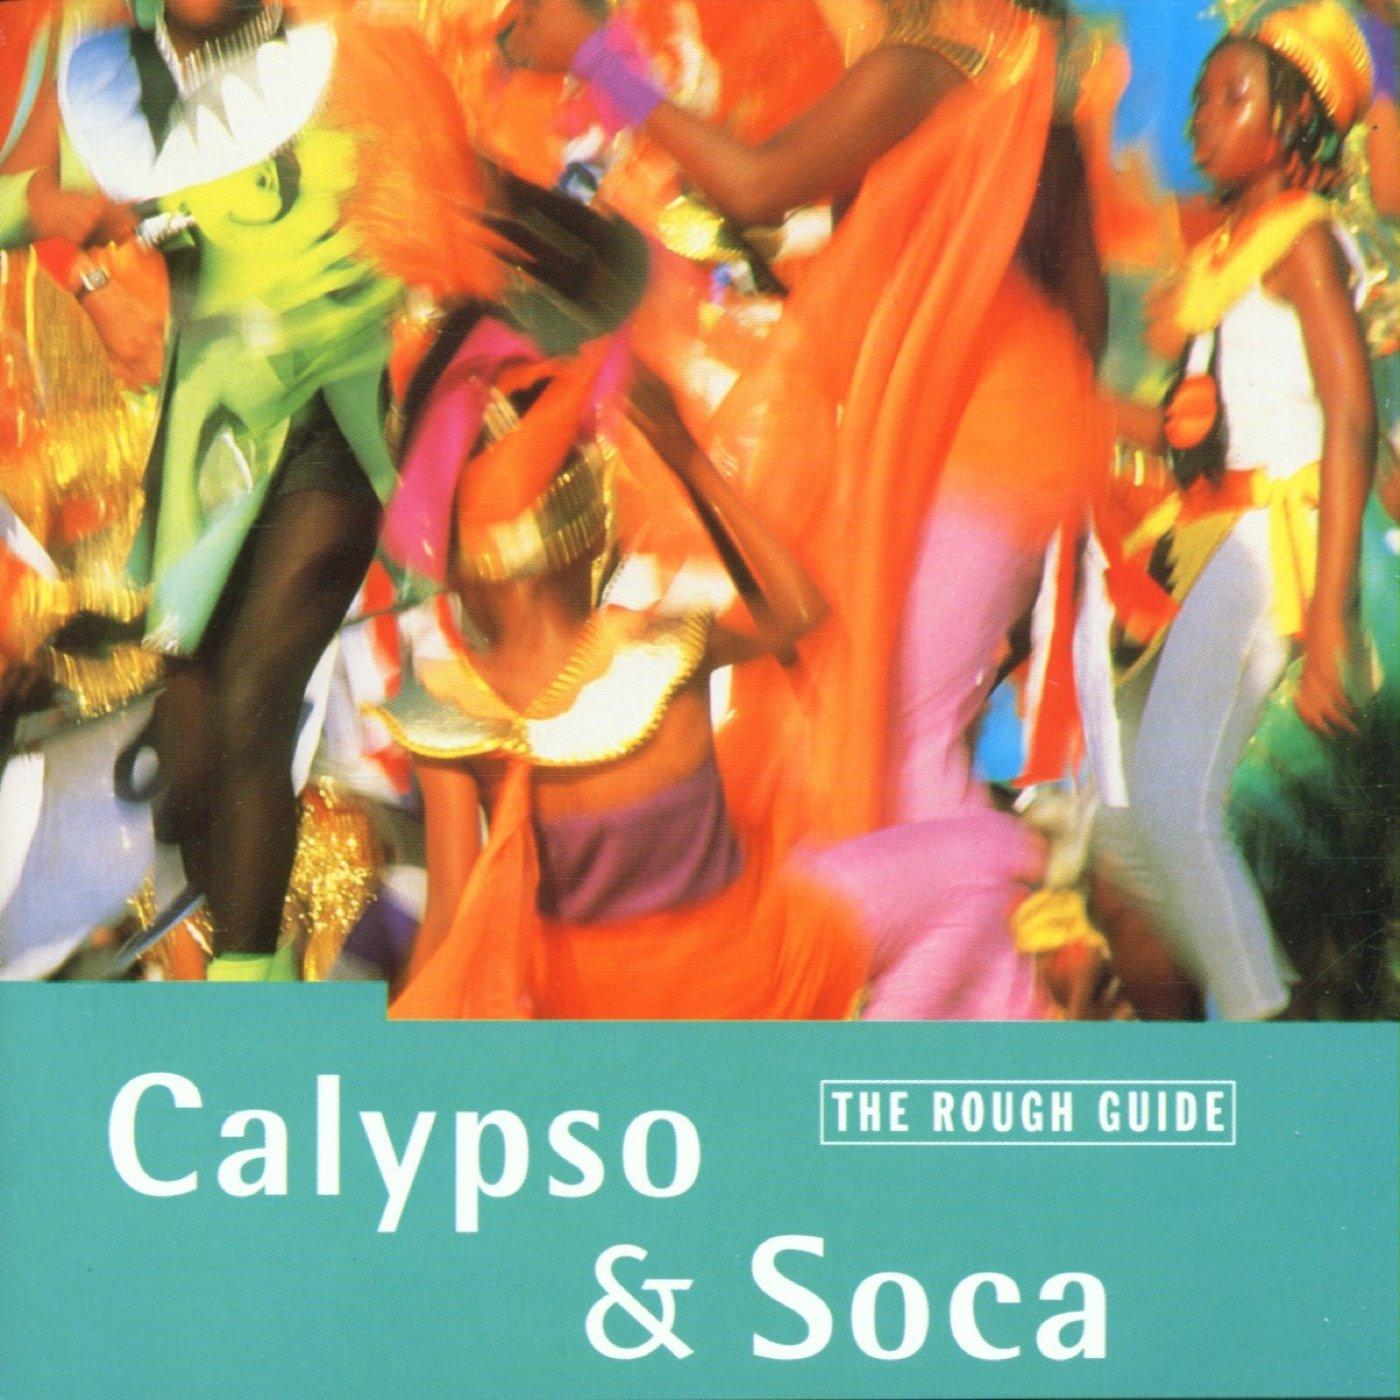 Rough Guide To Calypso And Soca, The